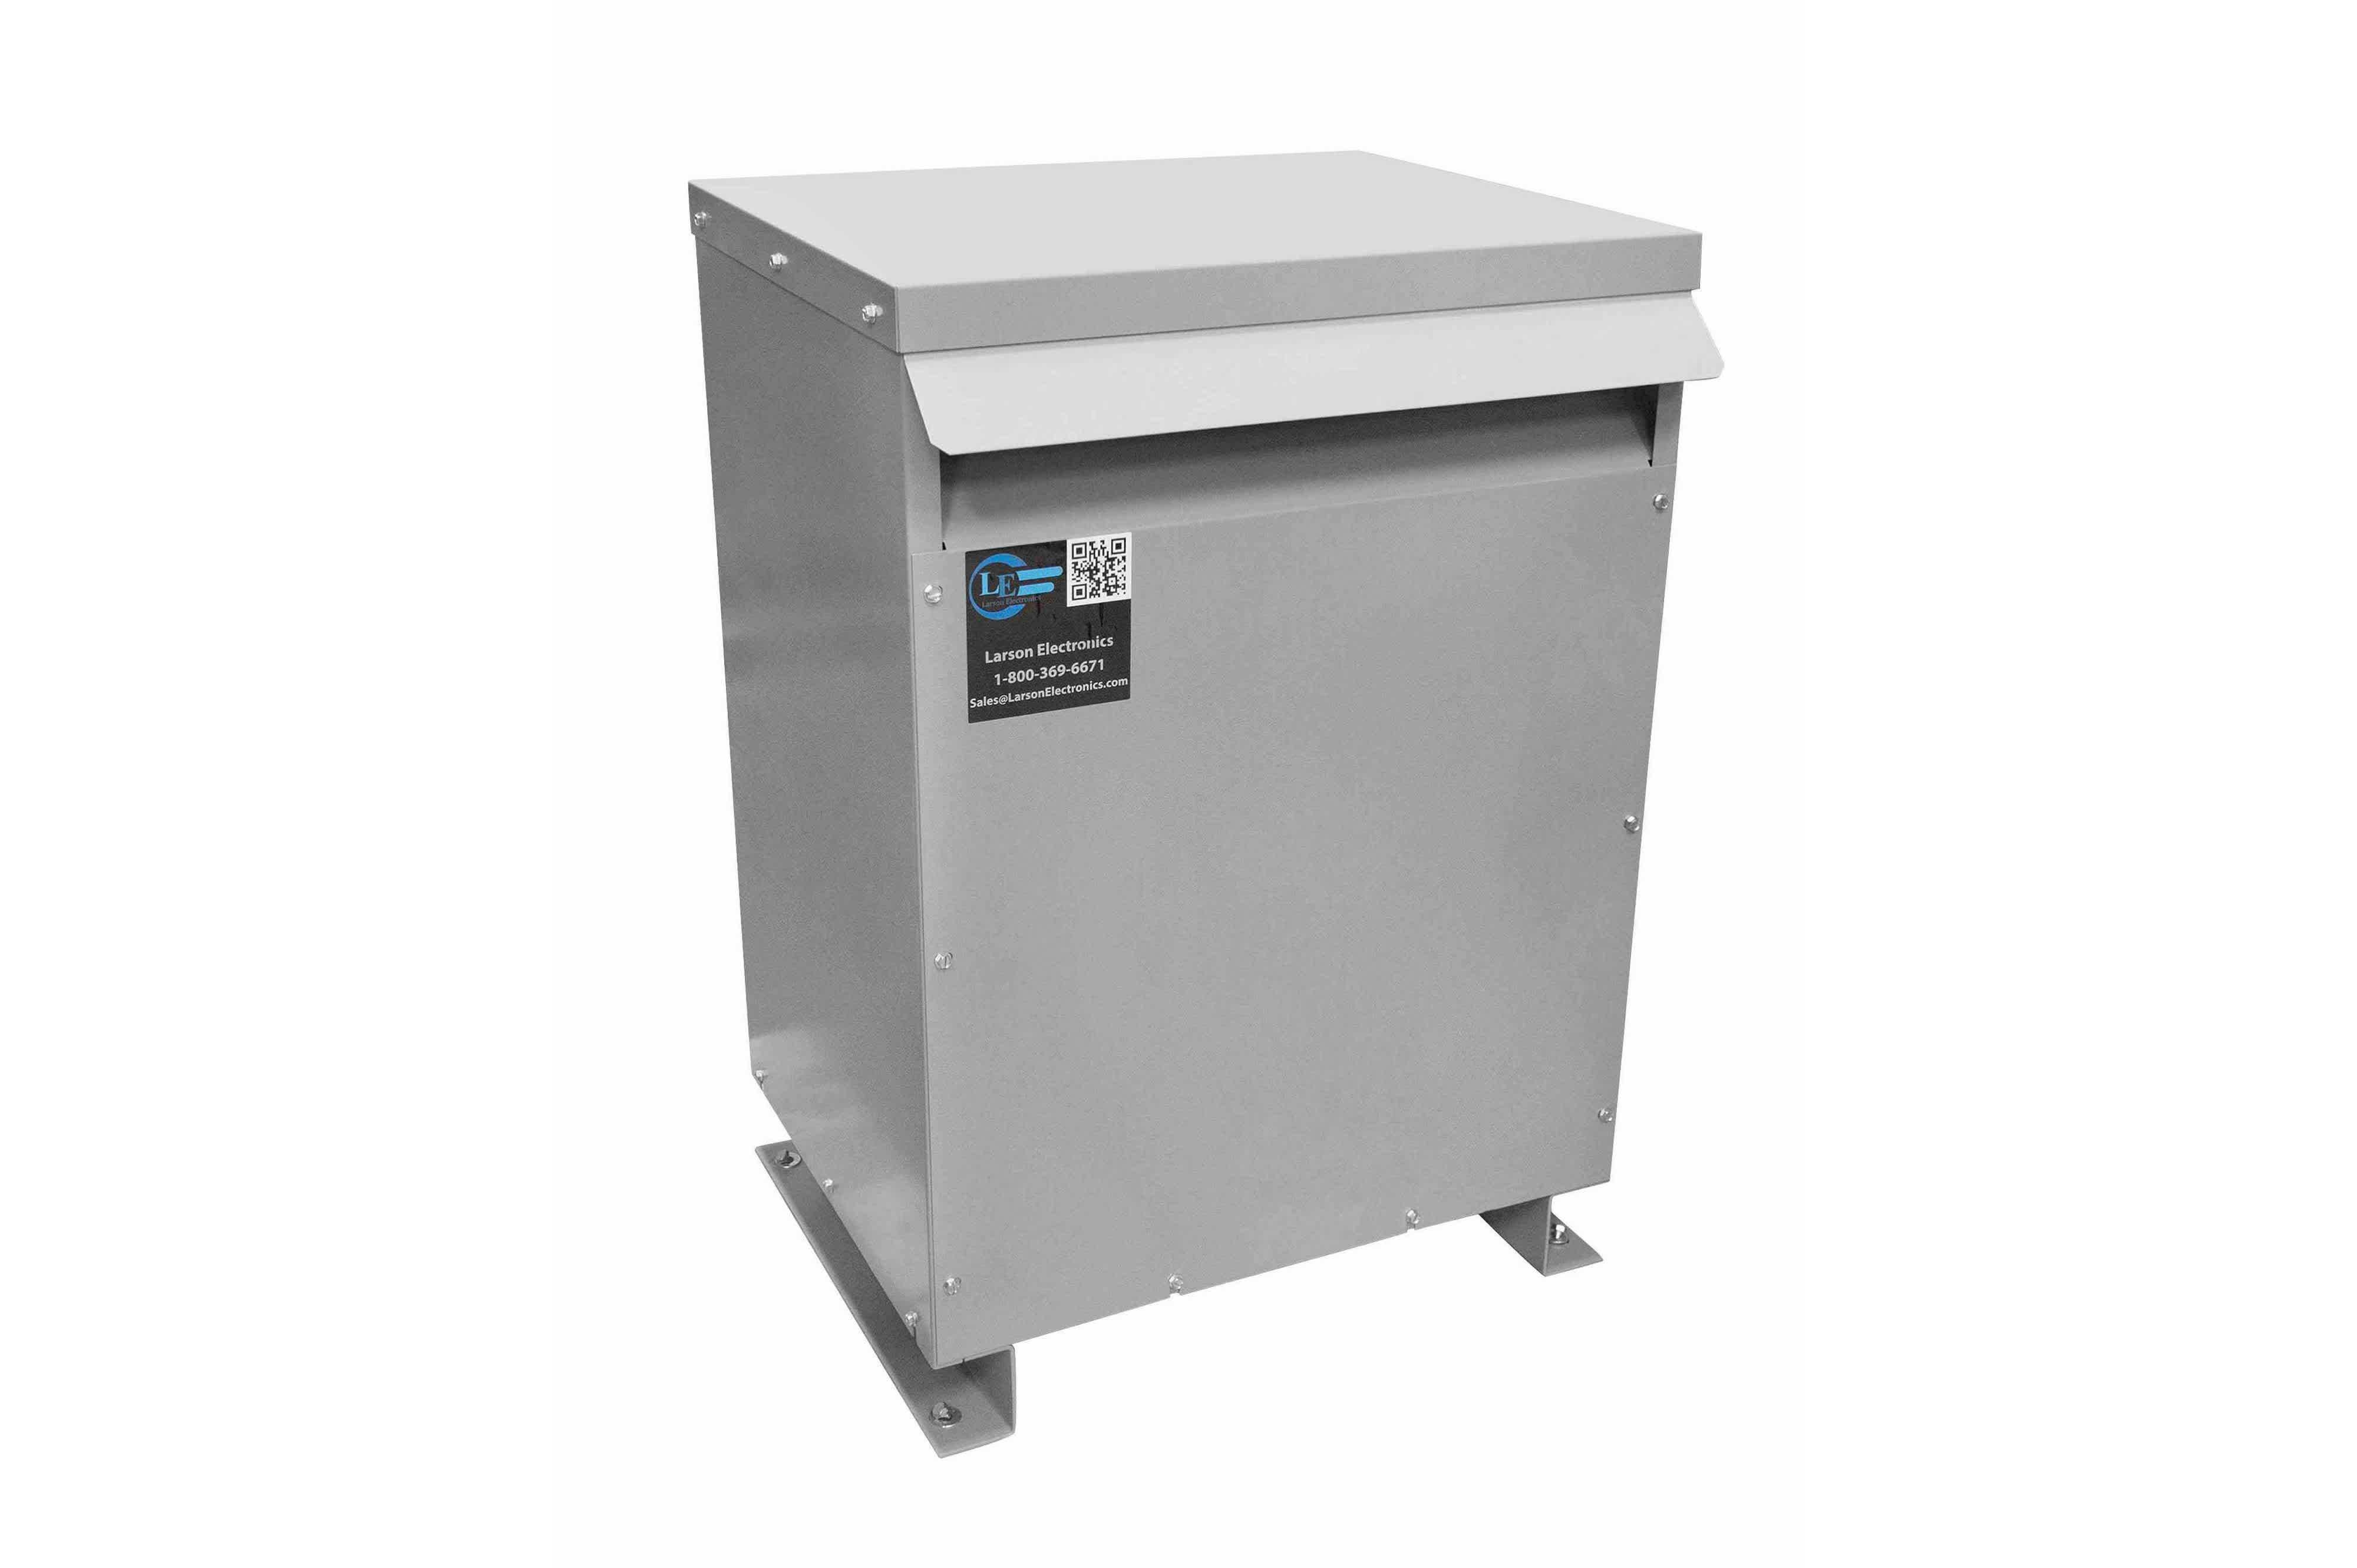 65 kVA 3PH Isolation Transformer, 480V Wye Primary, 240V/120 Delta Secondary, N3R, Ventilated, 60 Hz